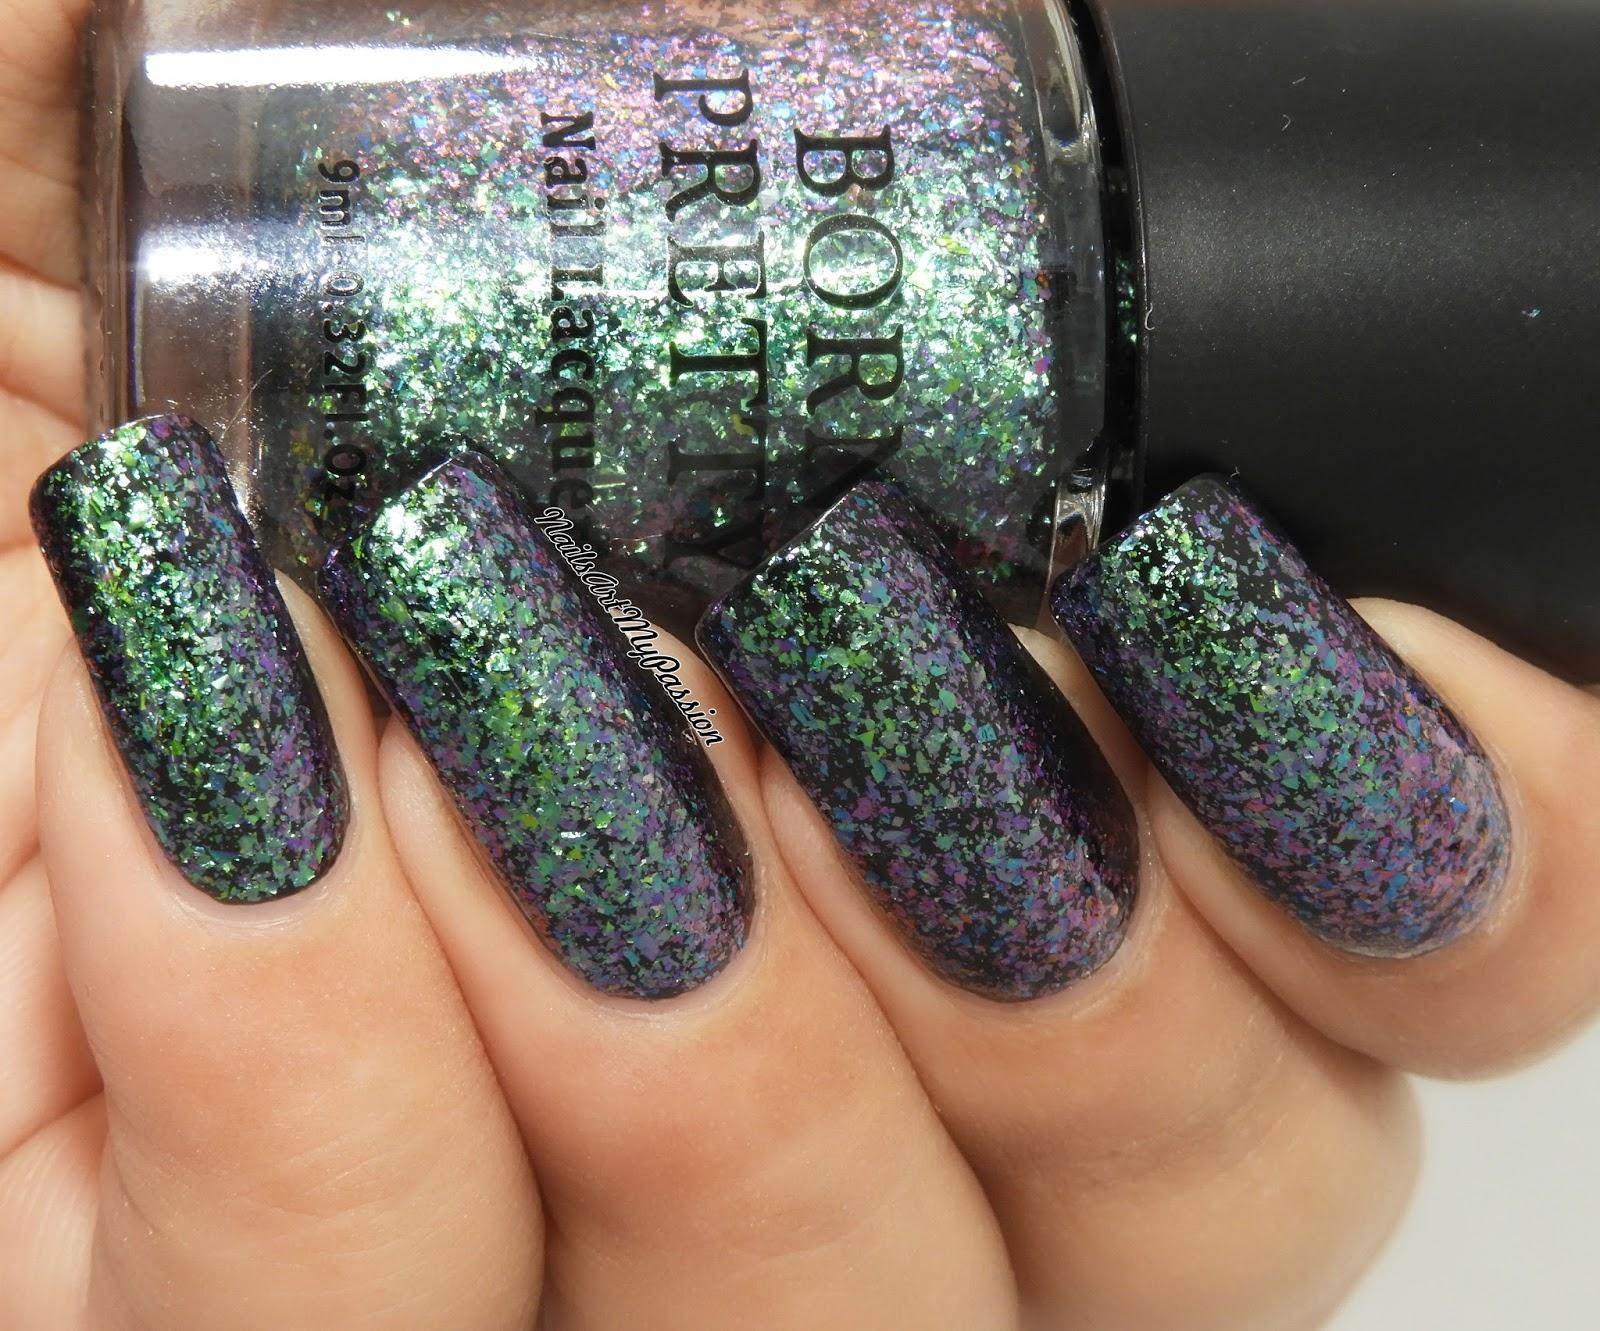 Nail Art My Passion: Mermaid\'s Tail Nails using BORN PRETTY ...